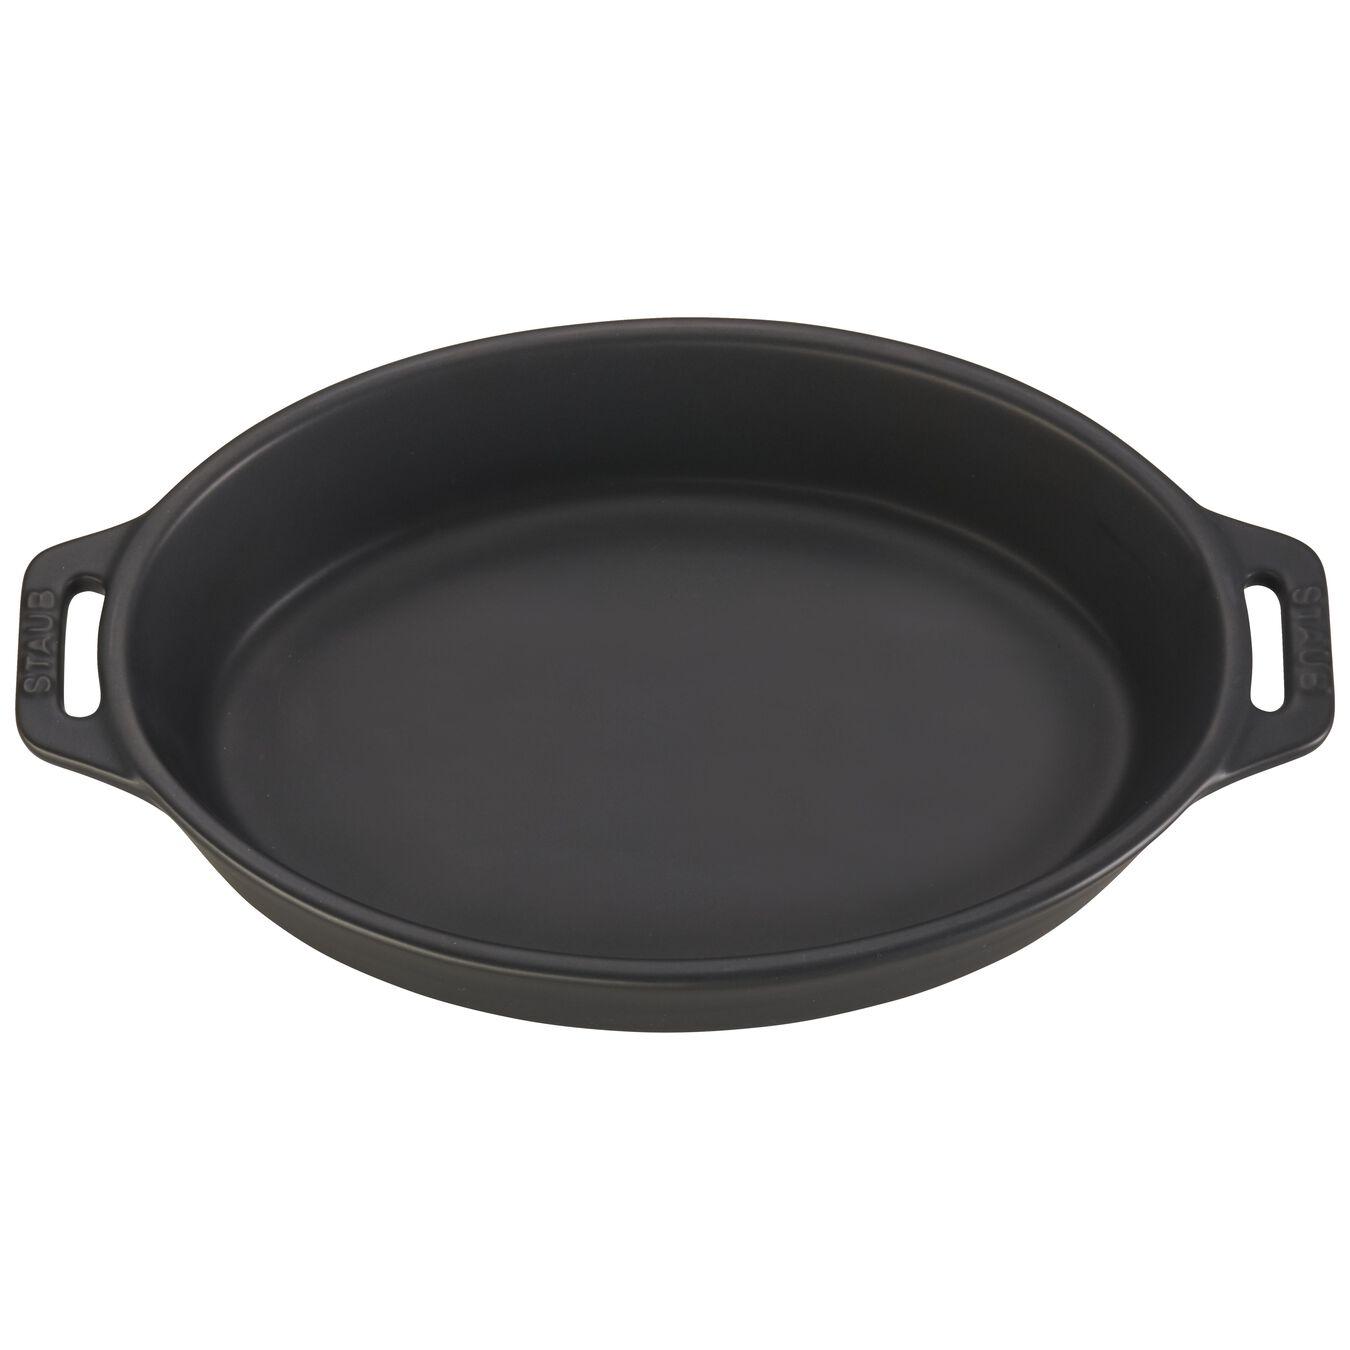 9-inch Oval Baking Dish - Matte Black,,large 2